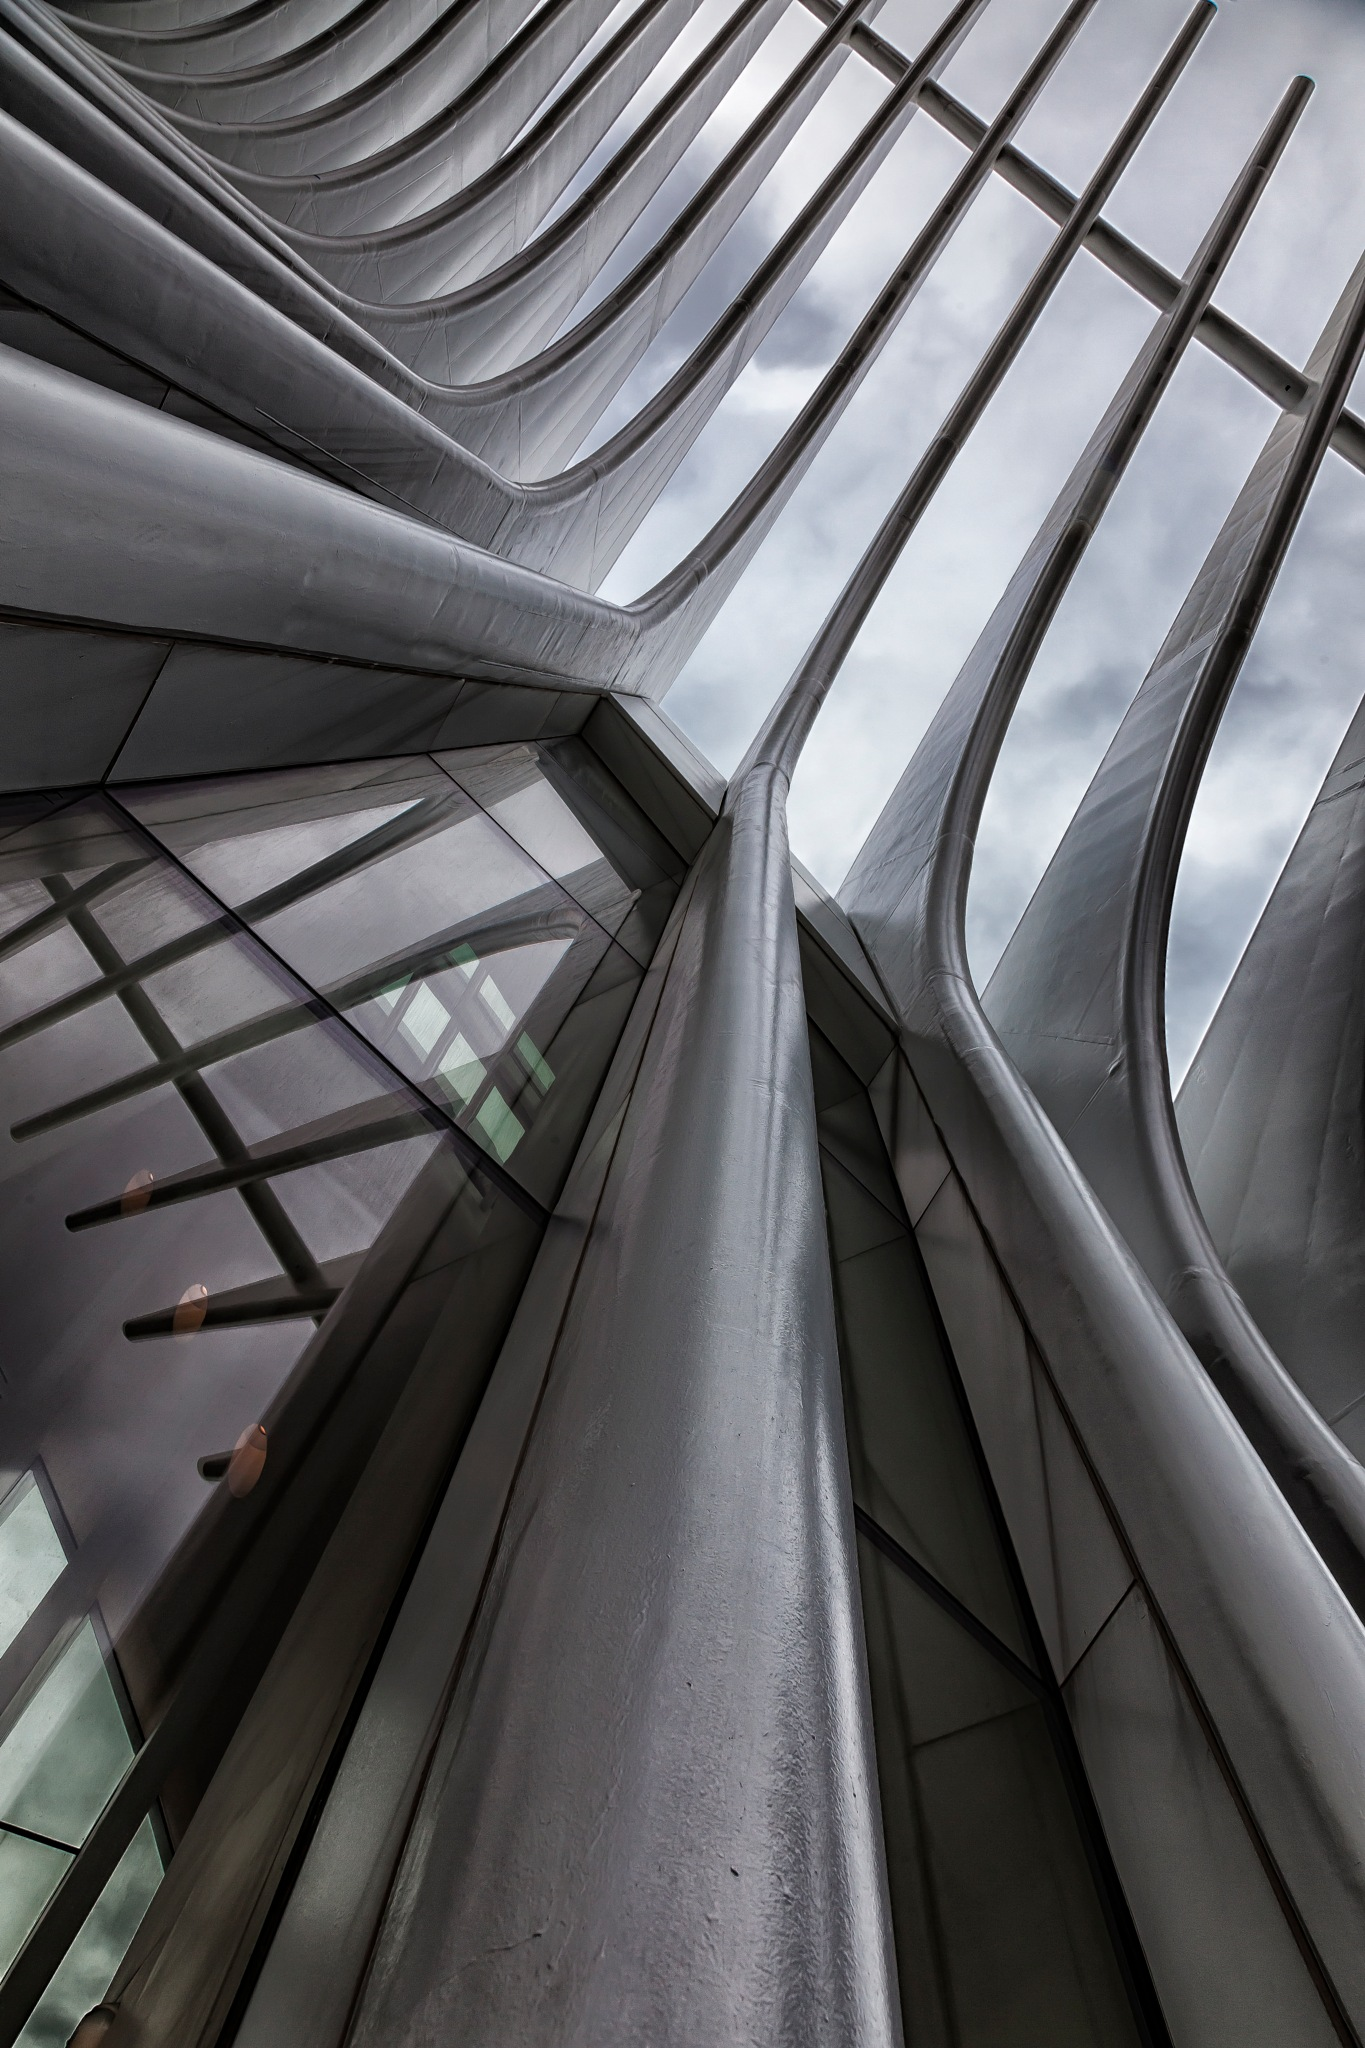 Detail Oculus Building NYC by robertullmann